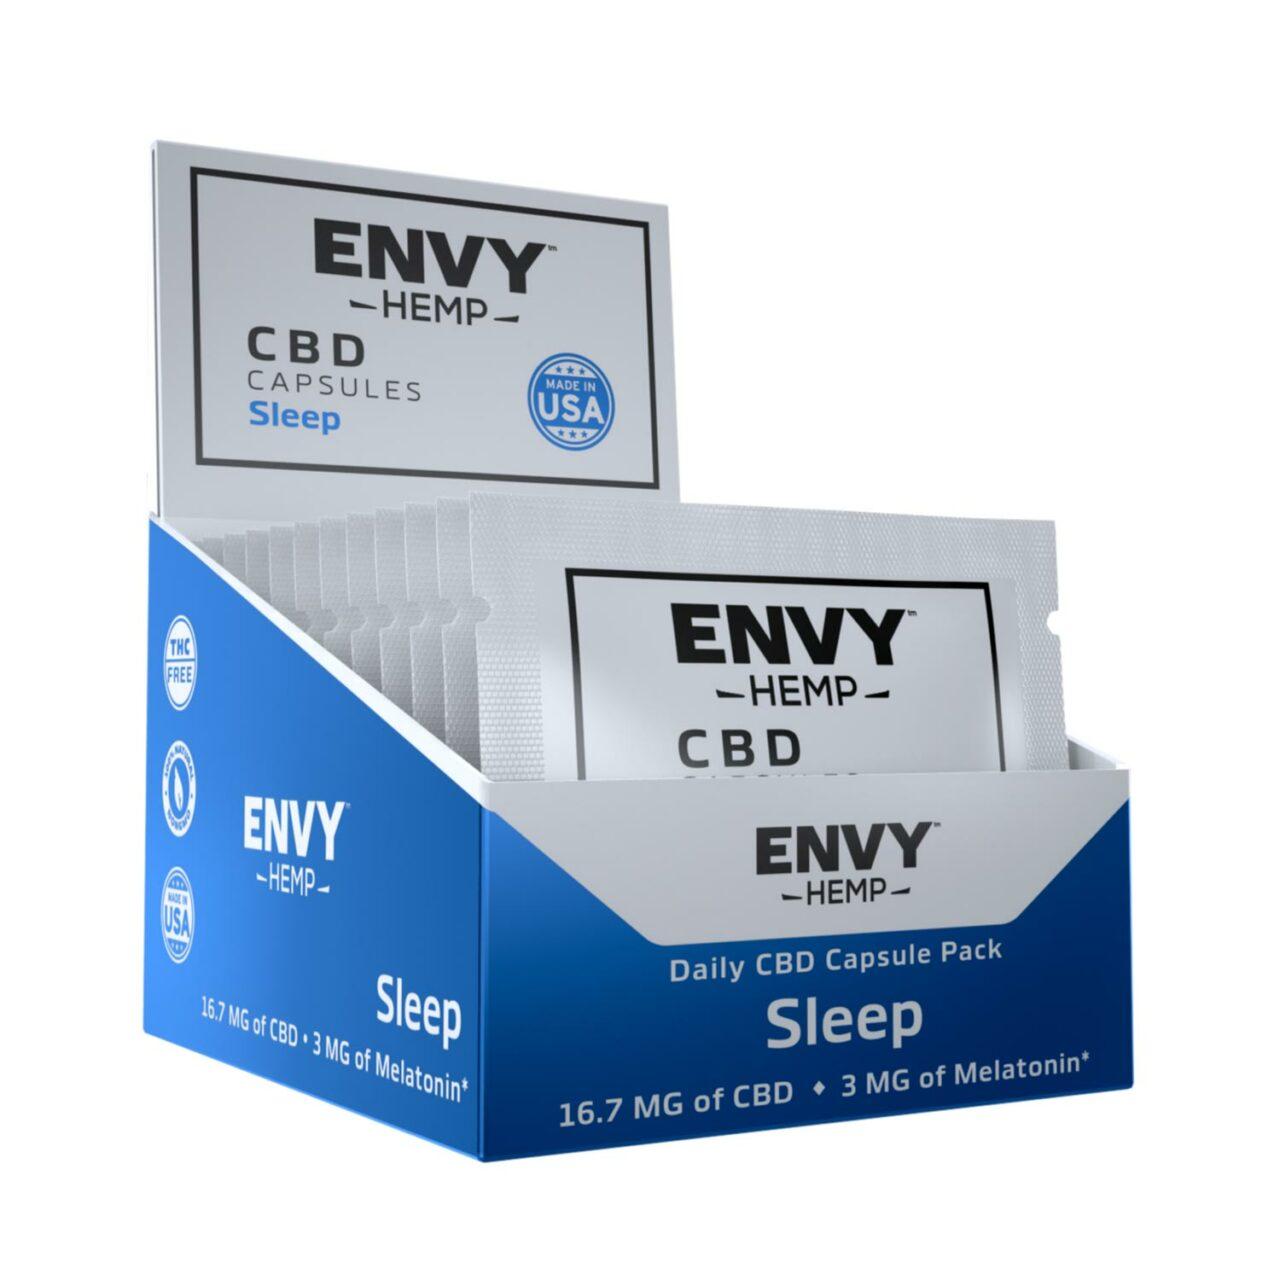 envy-hemp-cbd-capsules-for-sleeping-with-melatonin-30-count-16-7mg-of-cbd